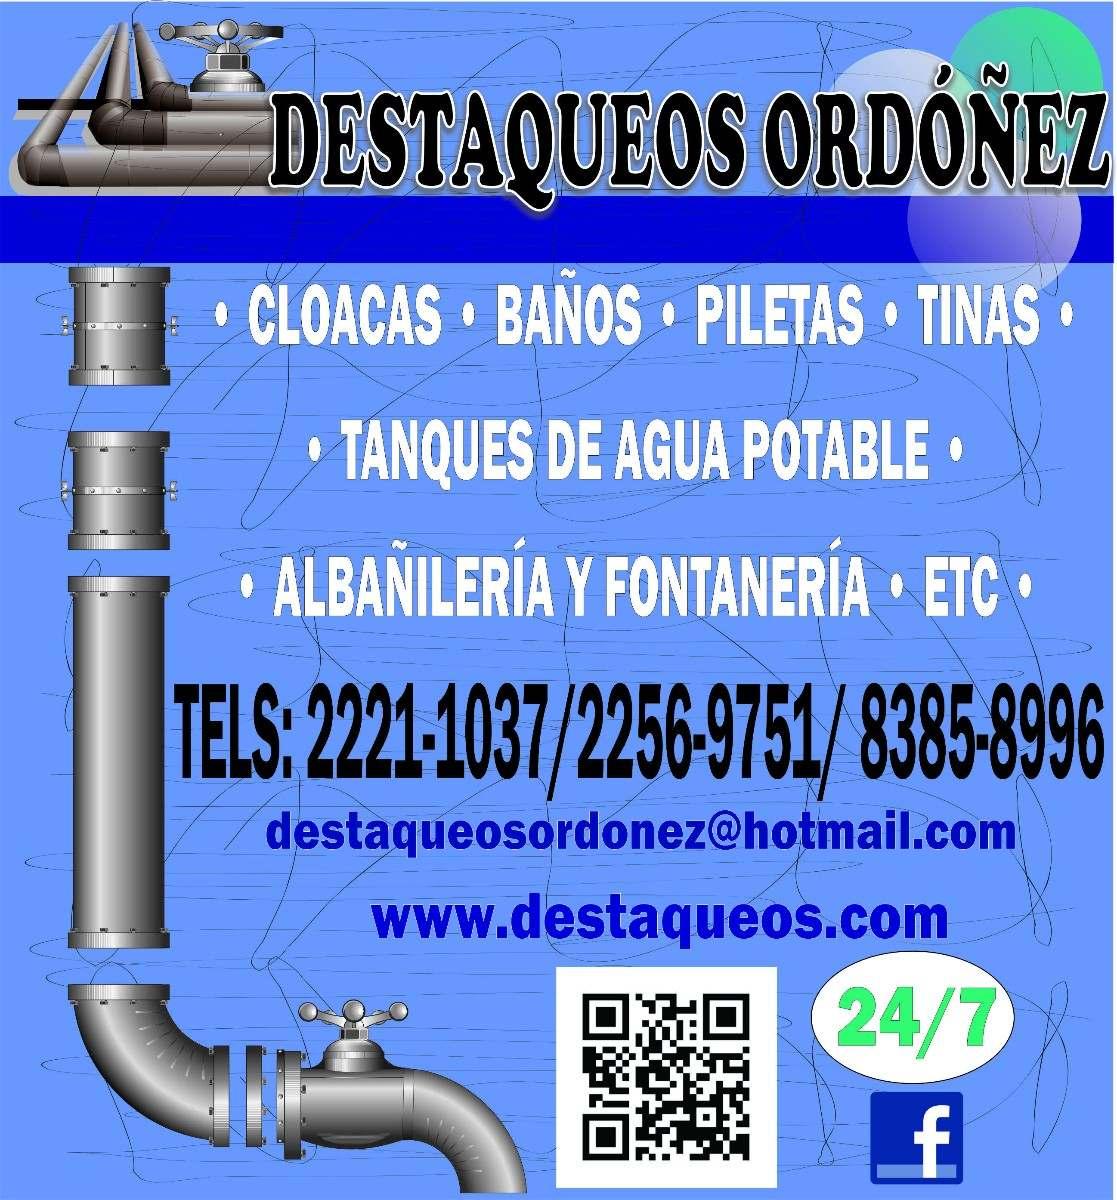 Limpieza de tuberias de agua potable limpieza de tuberias - Liquidos para desatascar tuberias ...